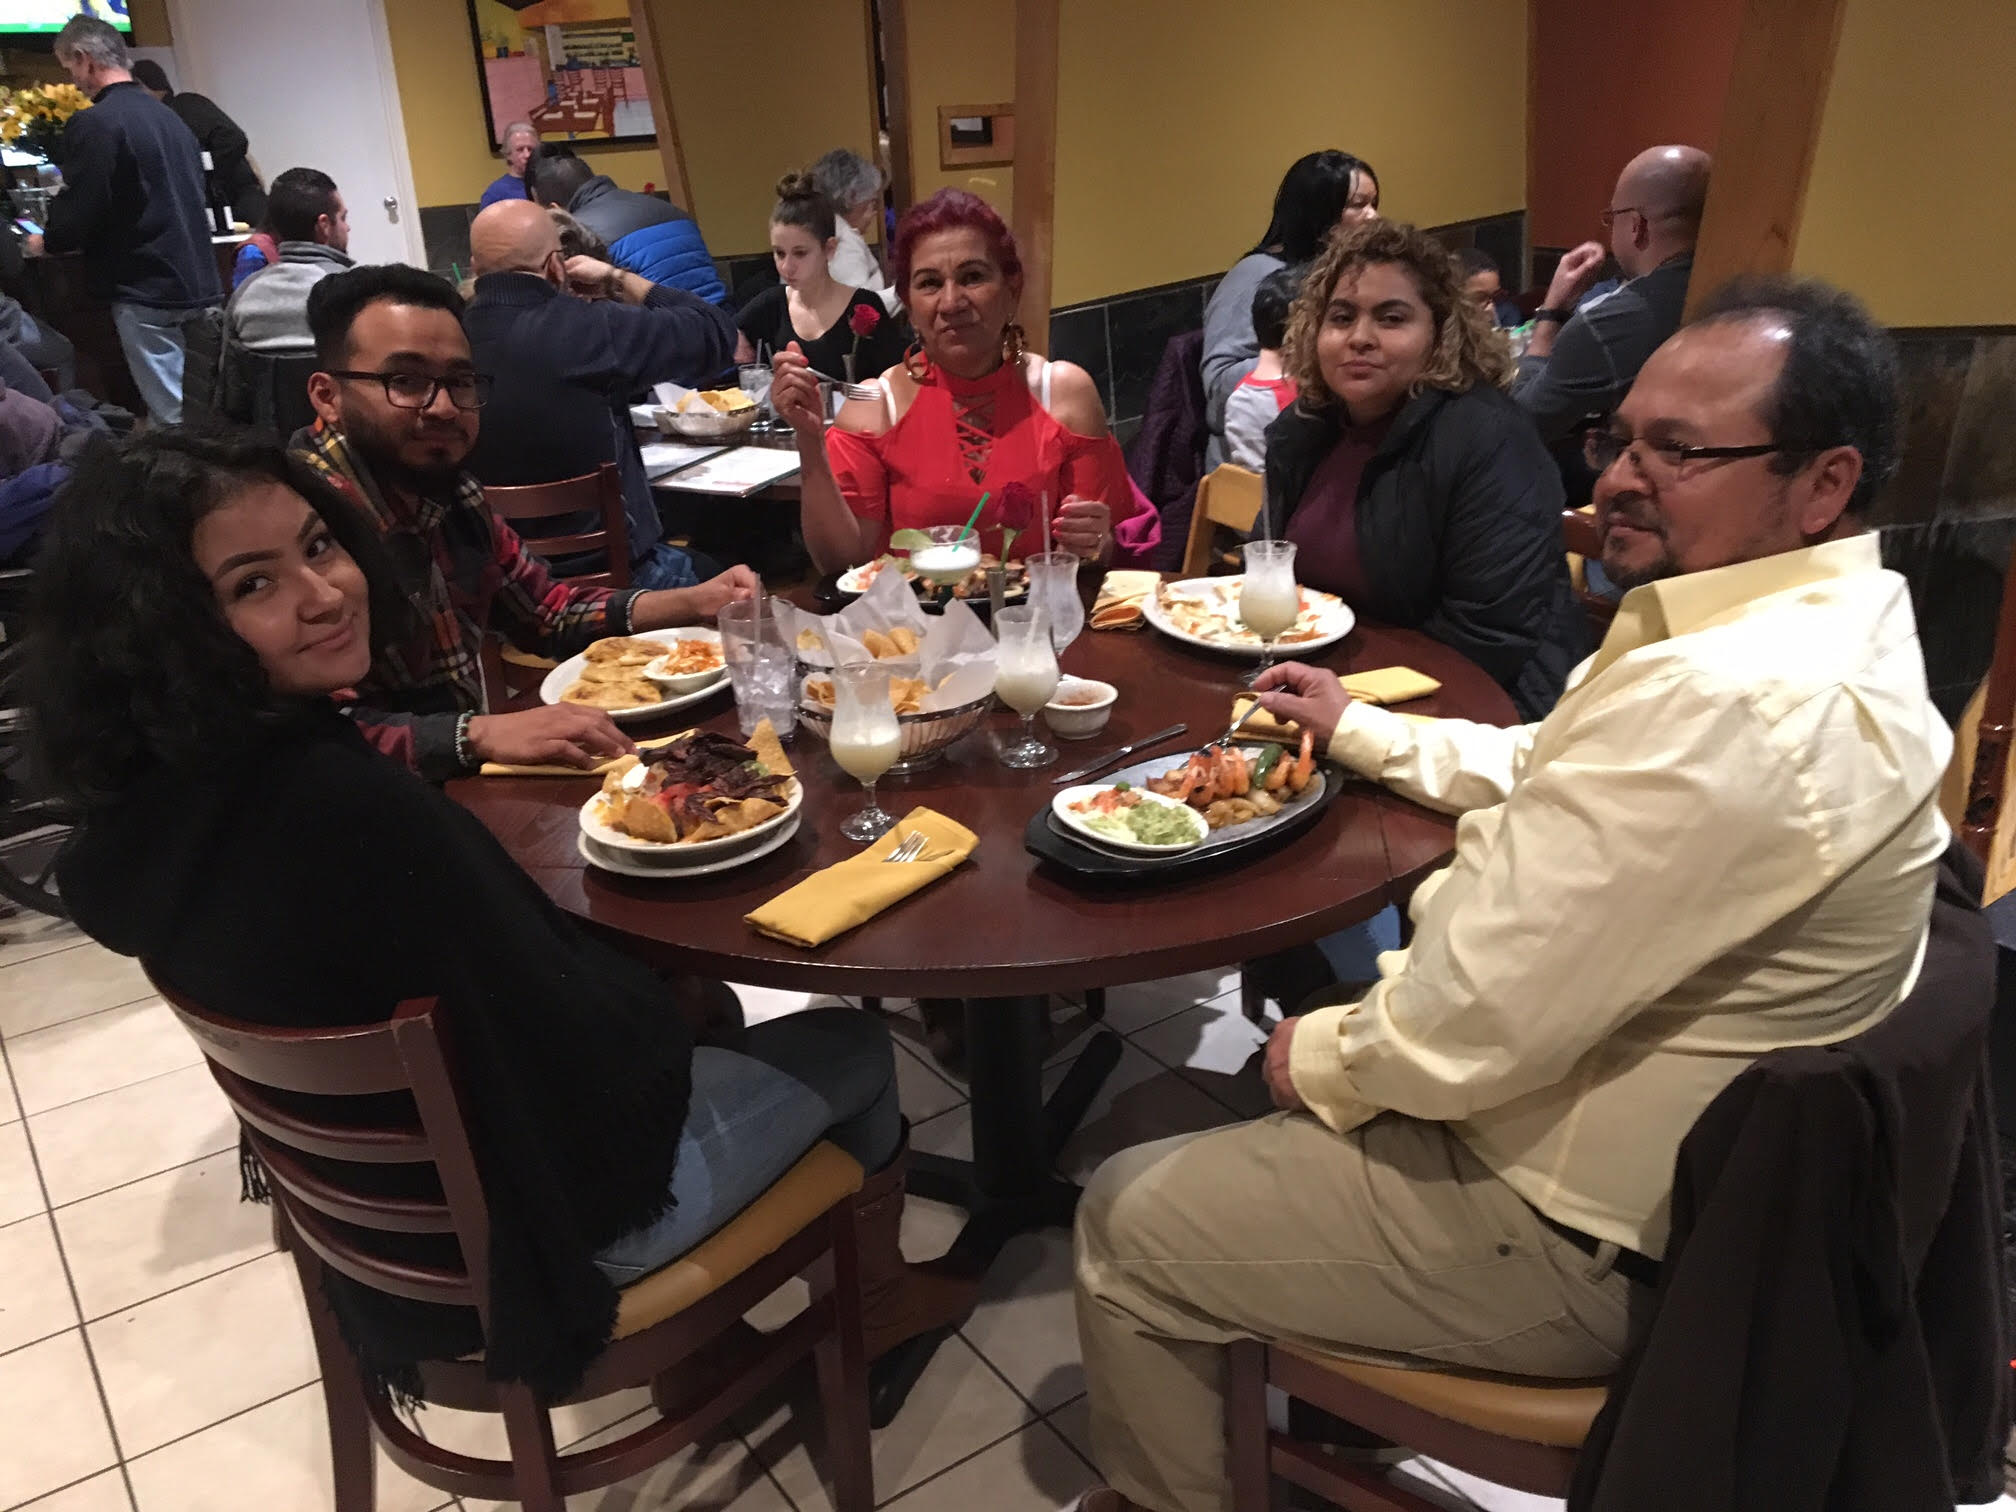 Juan Olivar and his family